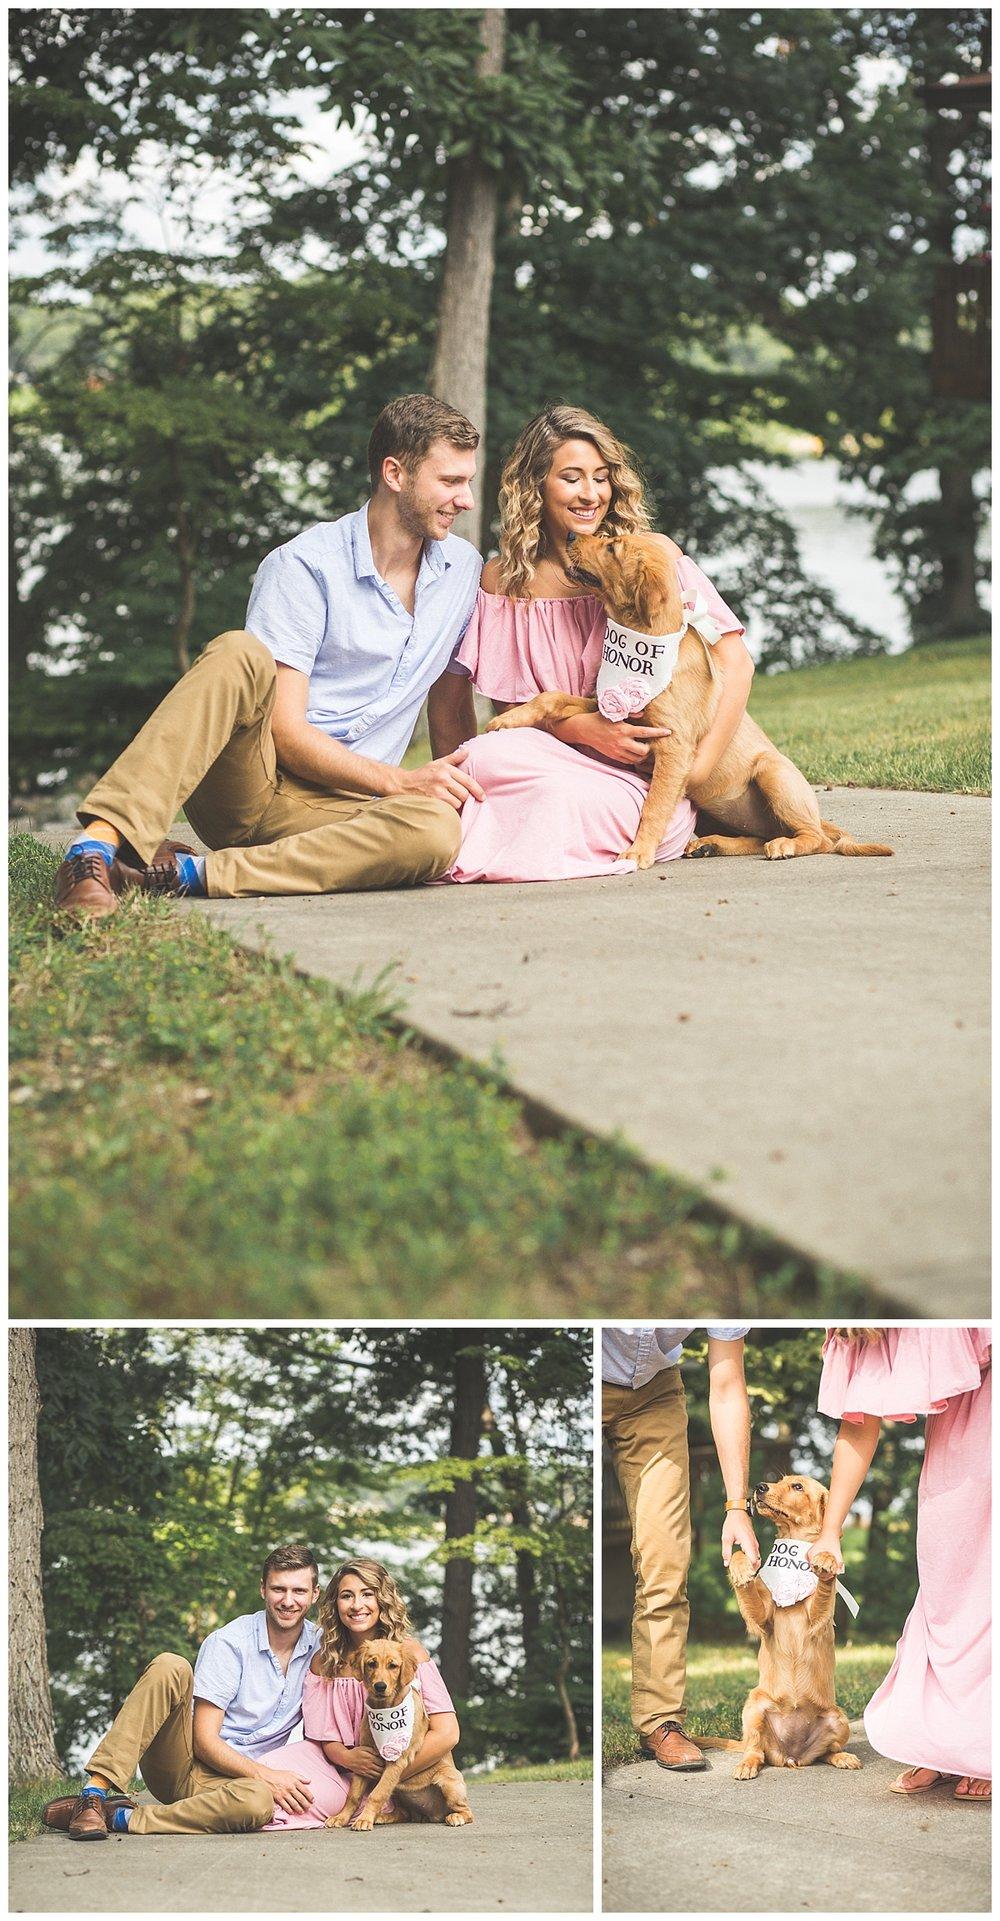 20180728-KaylaTyler-Engagement-blog-9.jpg